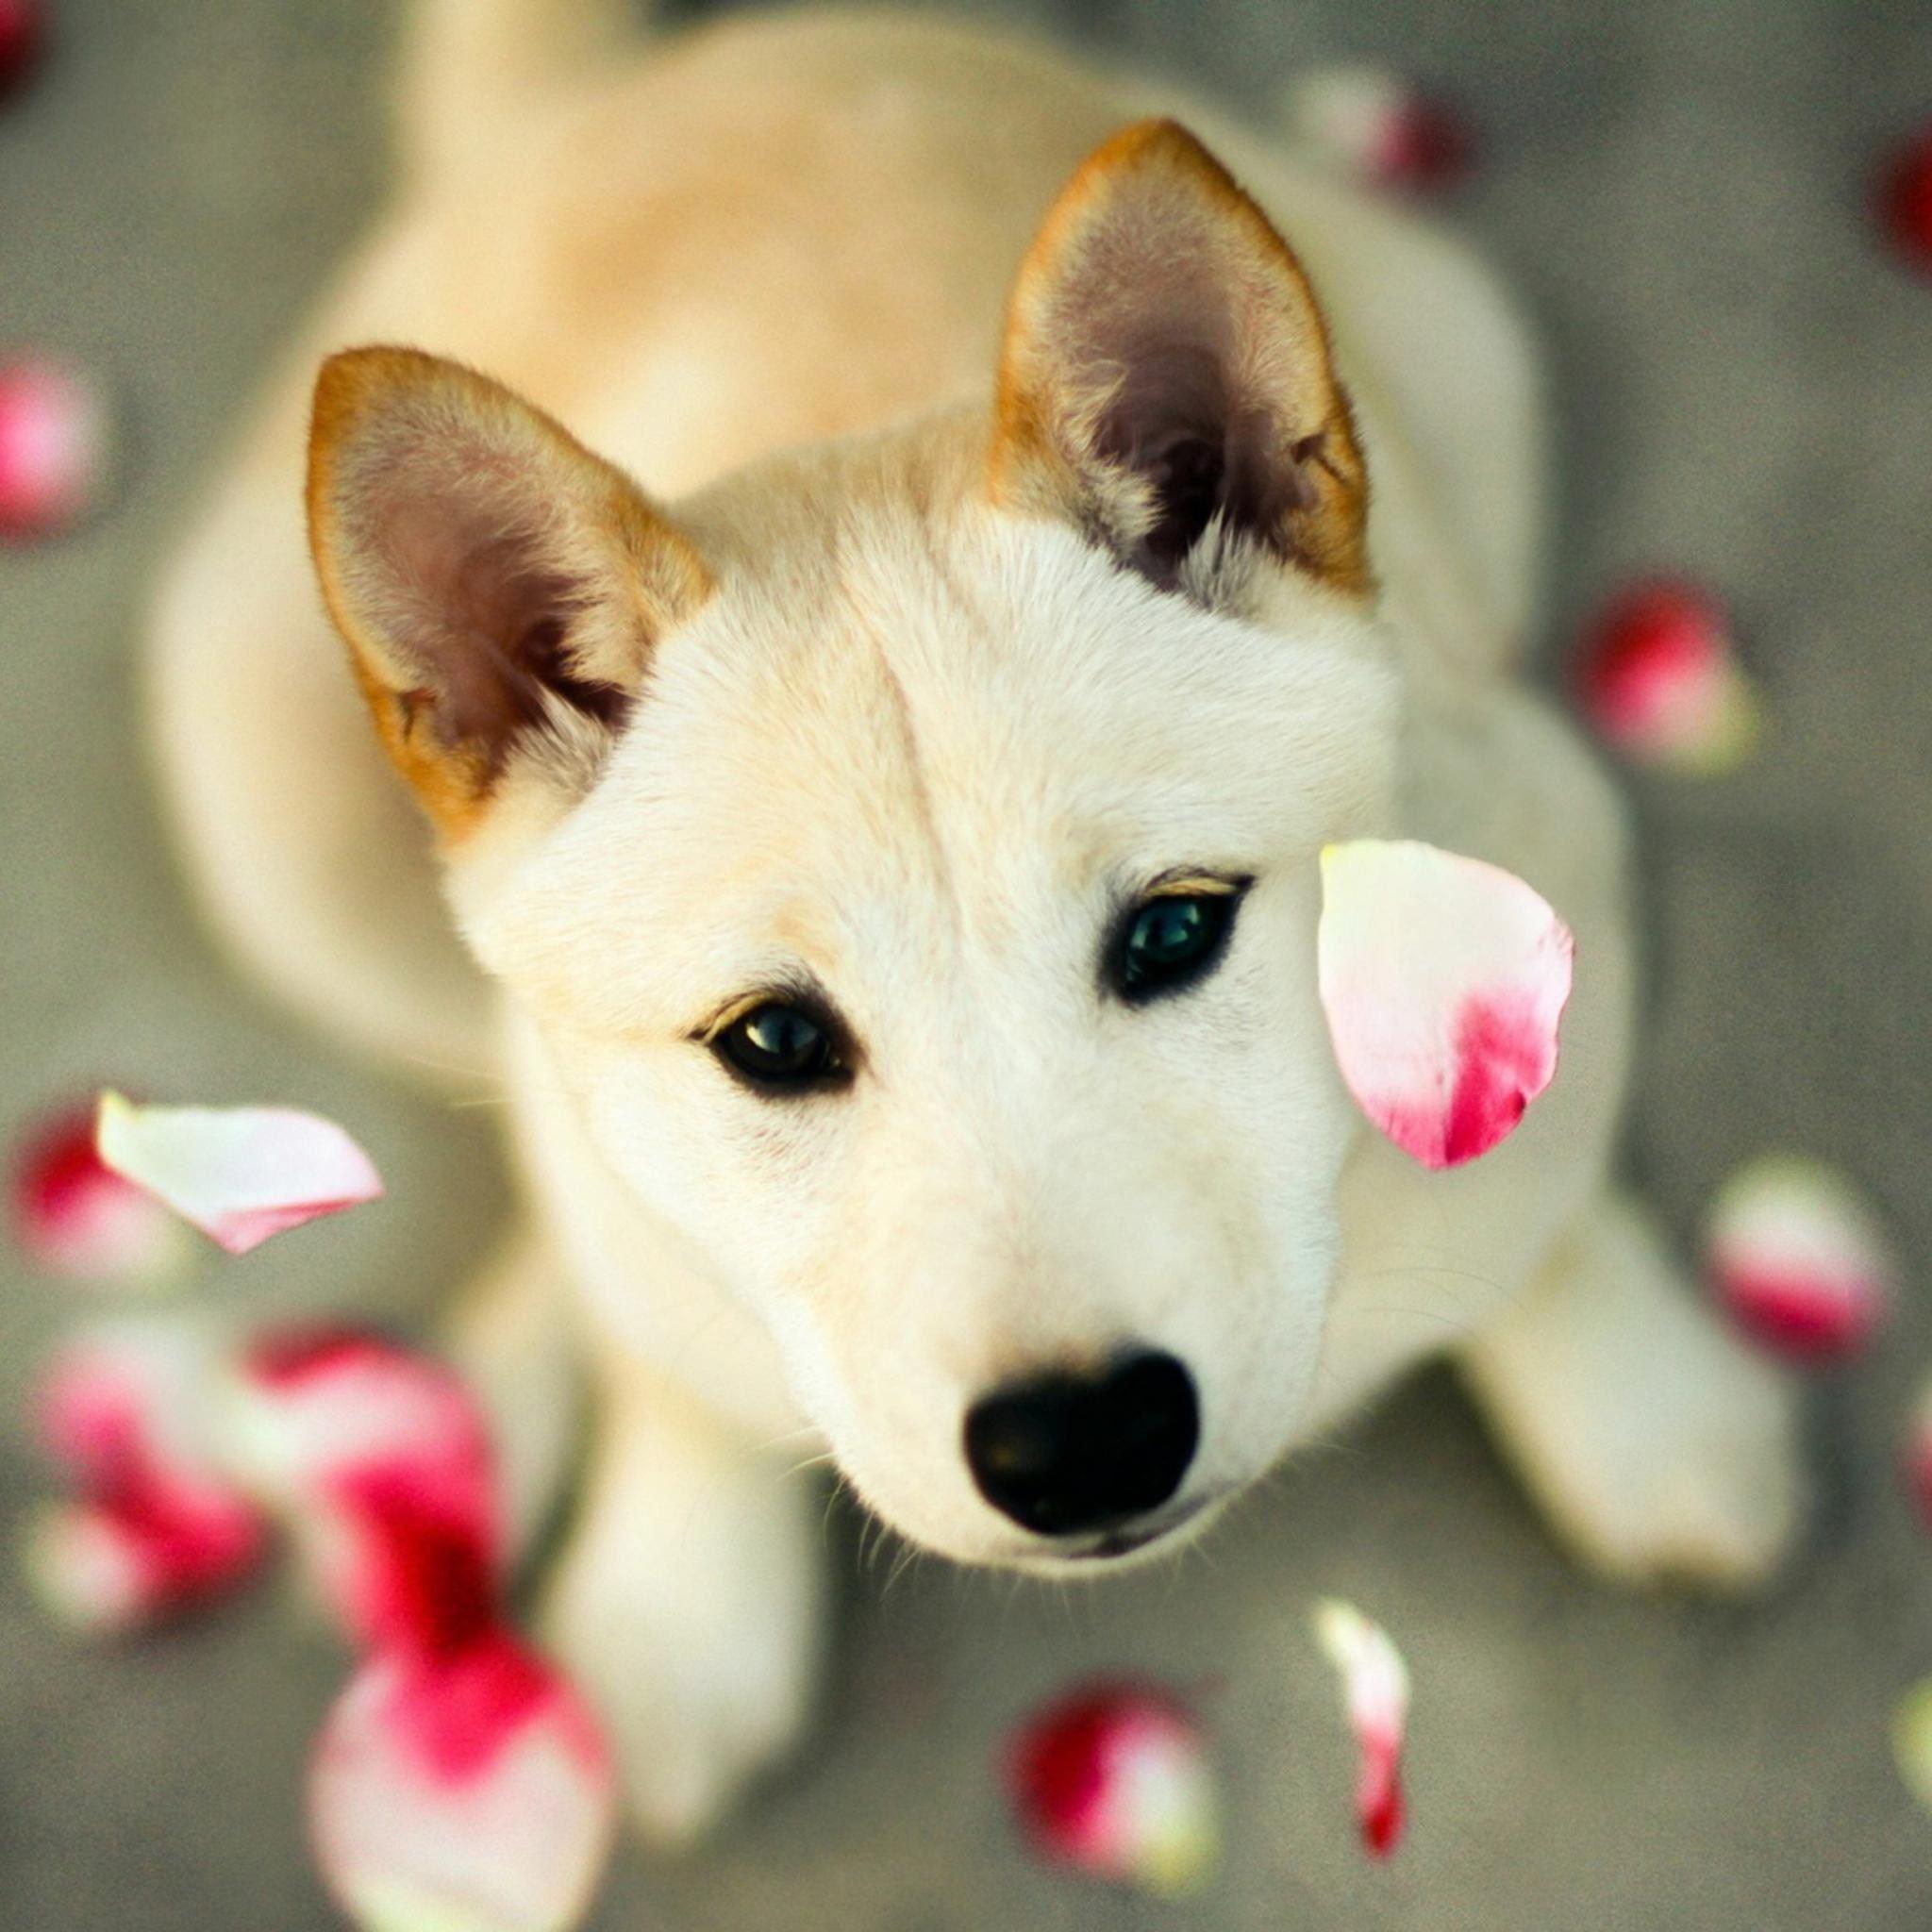 Dog Pet Looking Up Pink Petal Ipad Air Wallpapers Free Download